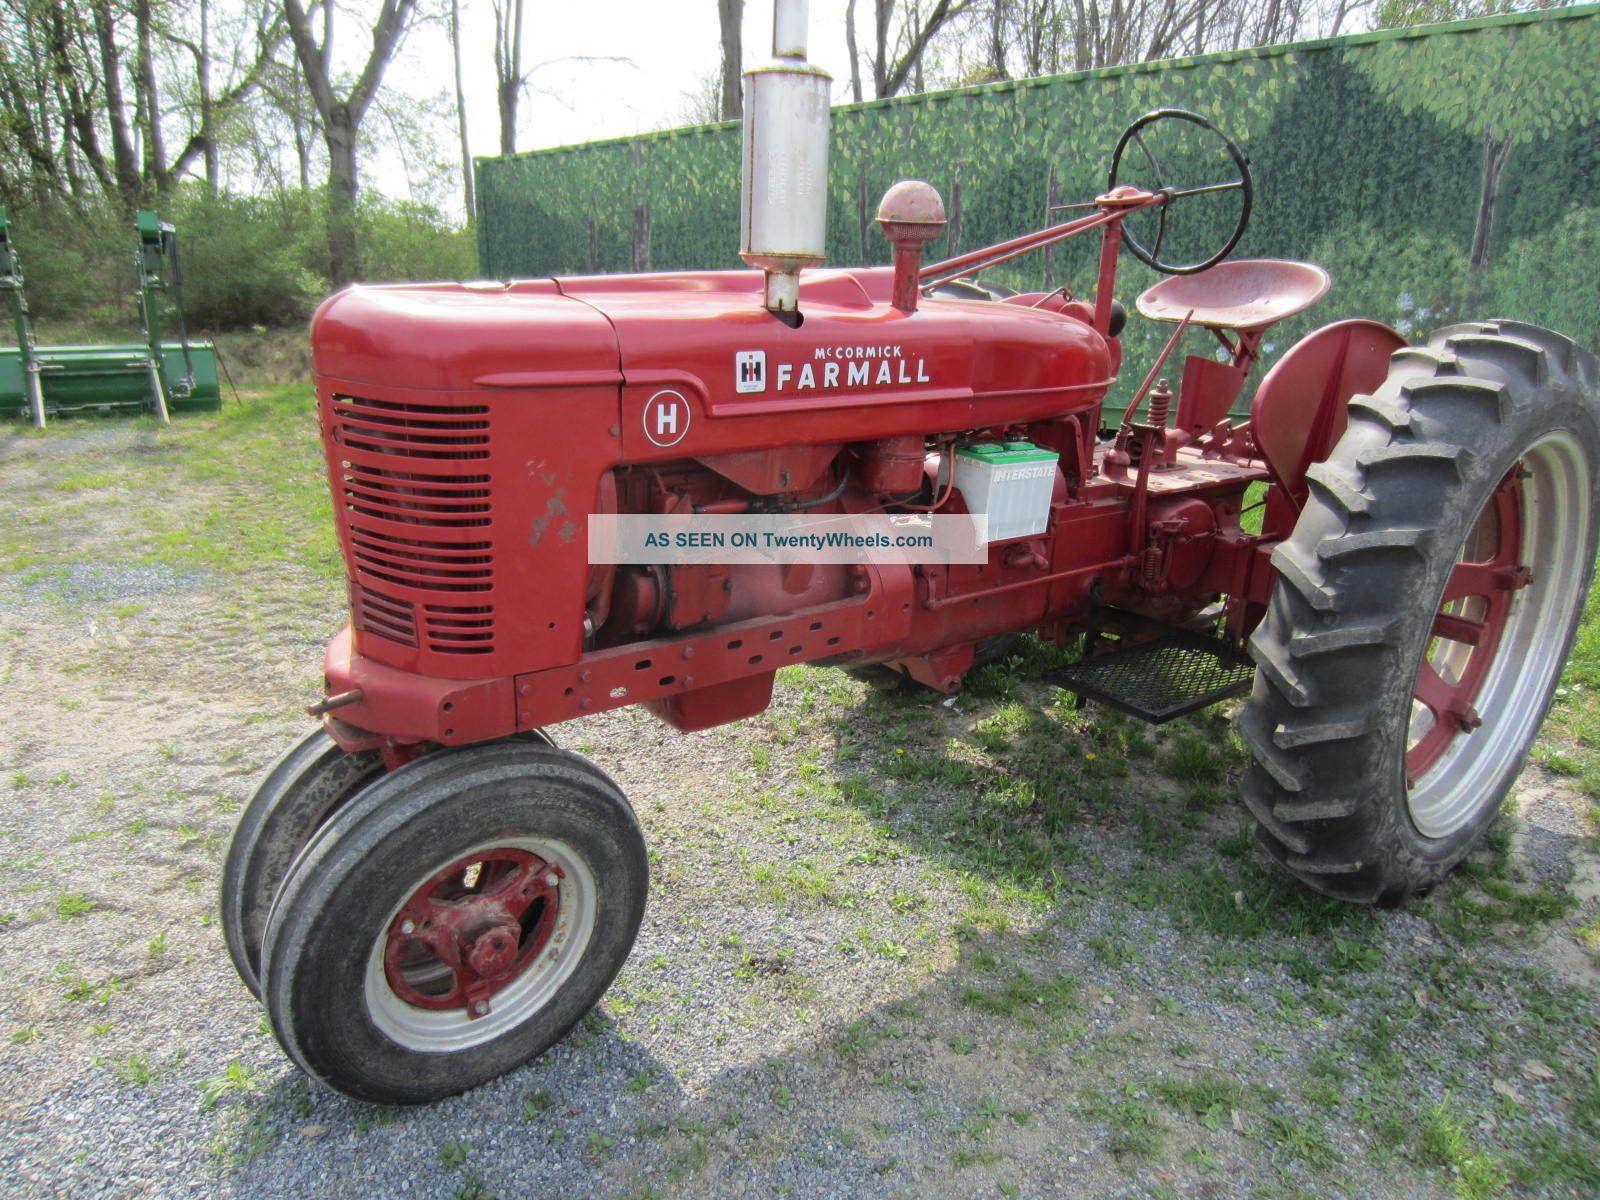 farmall_tractor_model_h_1942_1_lgw?resize\\\\\\\=665%2C499 farmall h wiring harness farmall h throttle linkage \u2022 wiring Chevy Engine Wiring Harness at bakdesigns.co